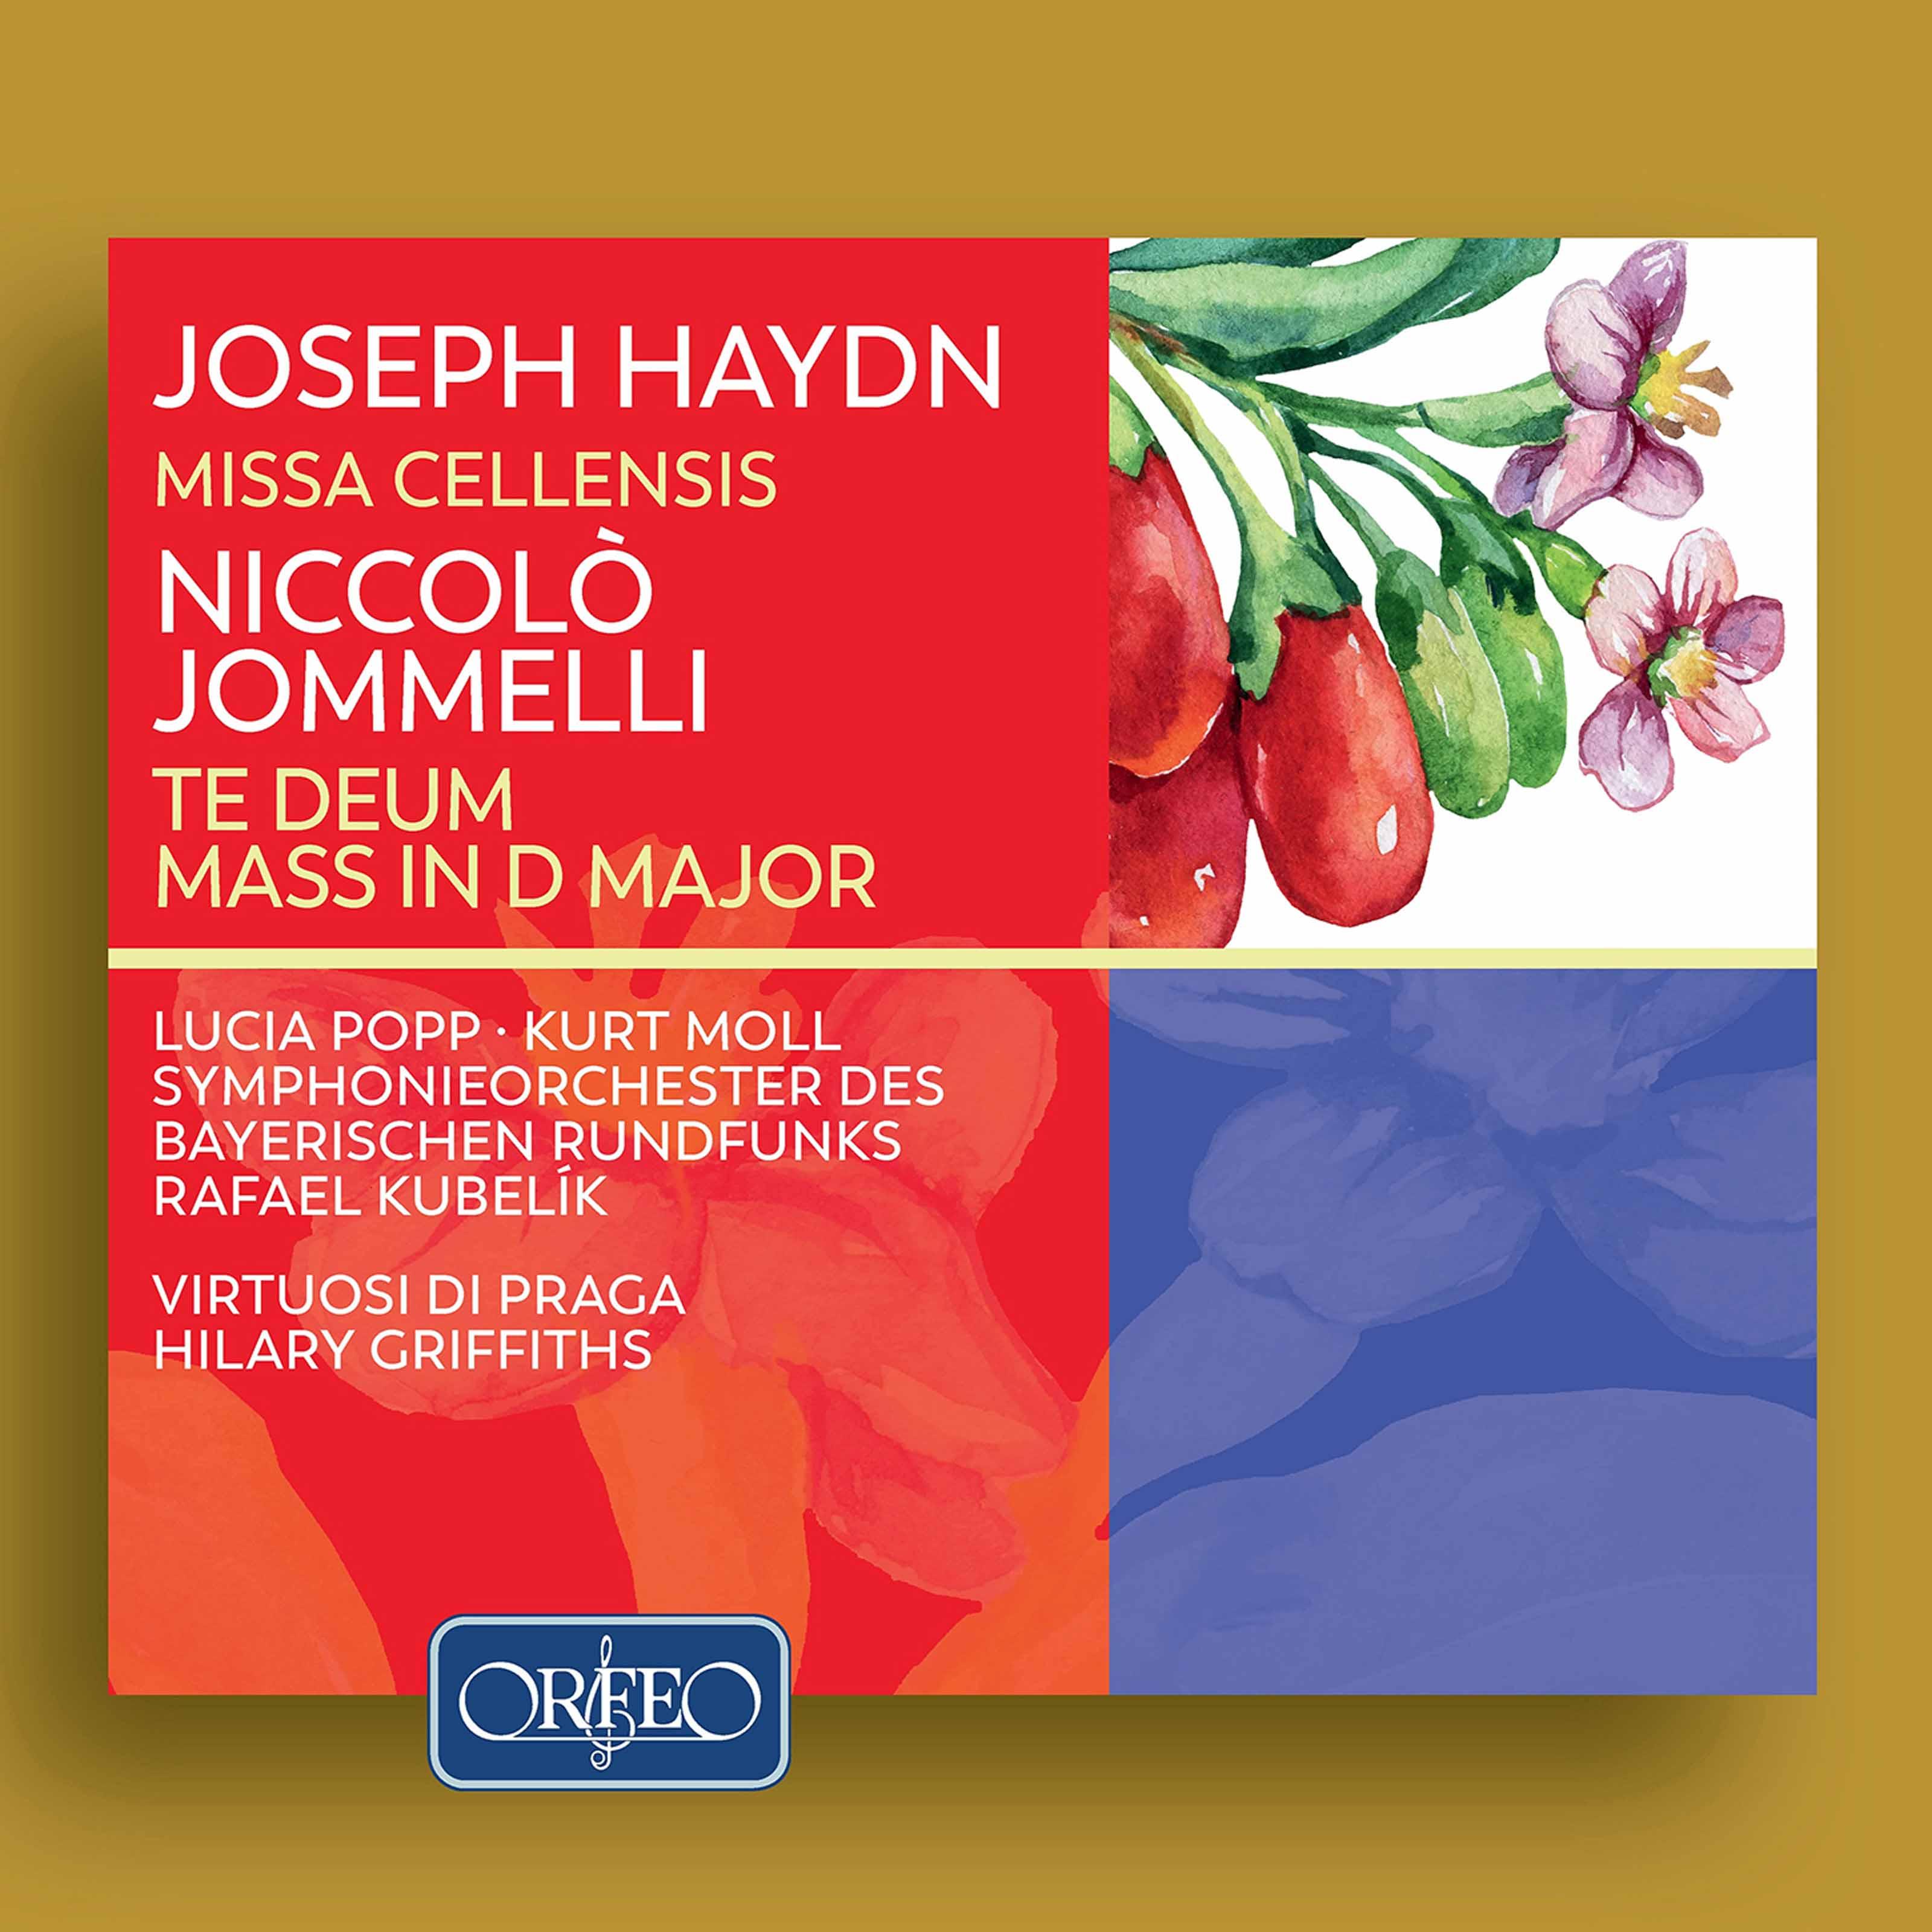 Haydn: Missa Cellensis - Jommelli: Te Deum & Mass in D Major Classical Orfeo